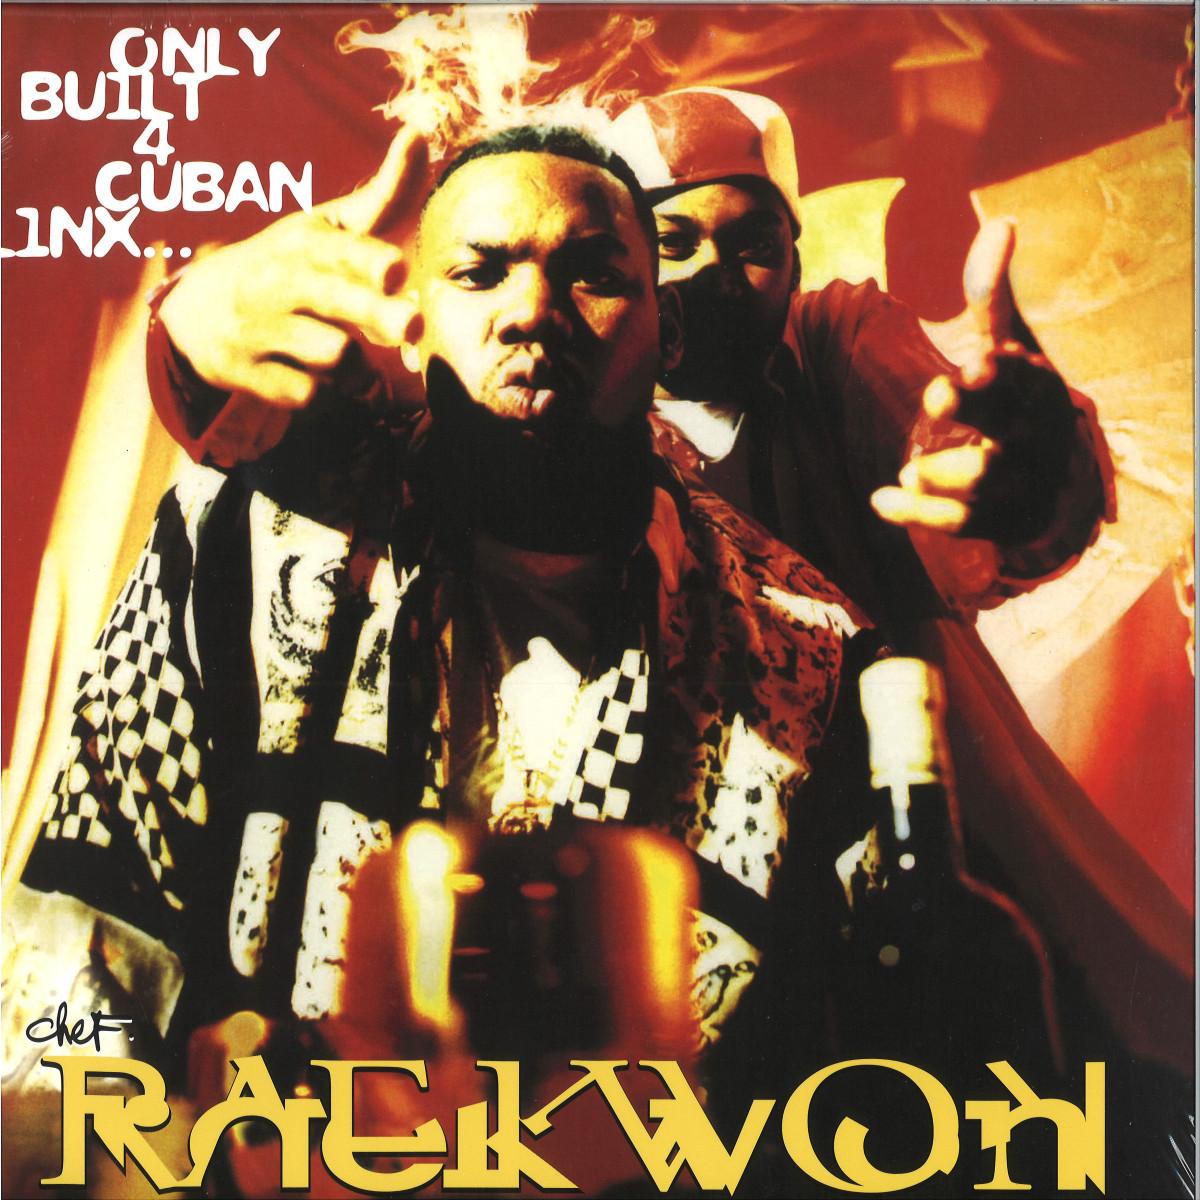 raekwon only built 4 cuban linx instrumentals